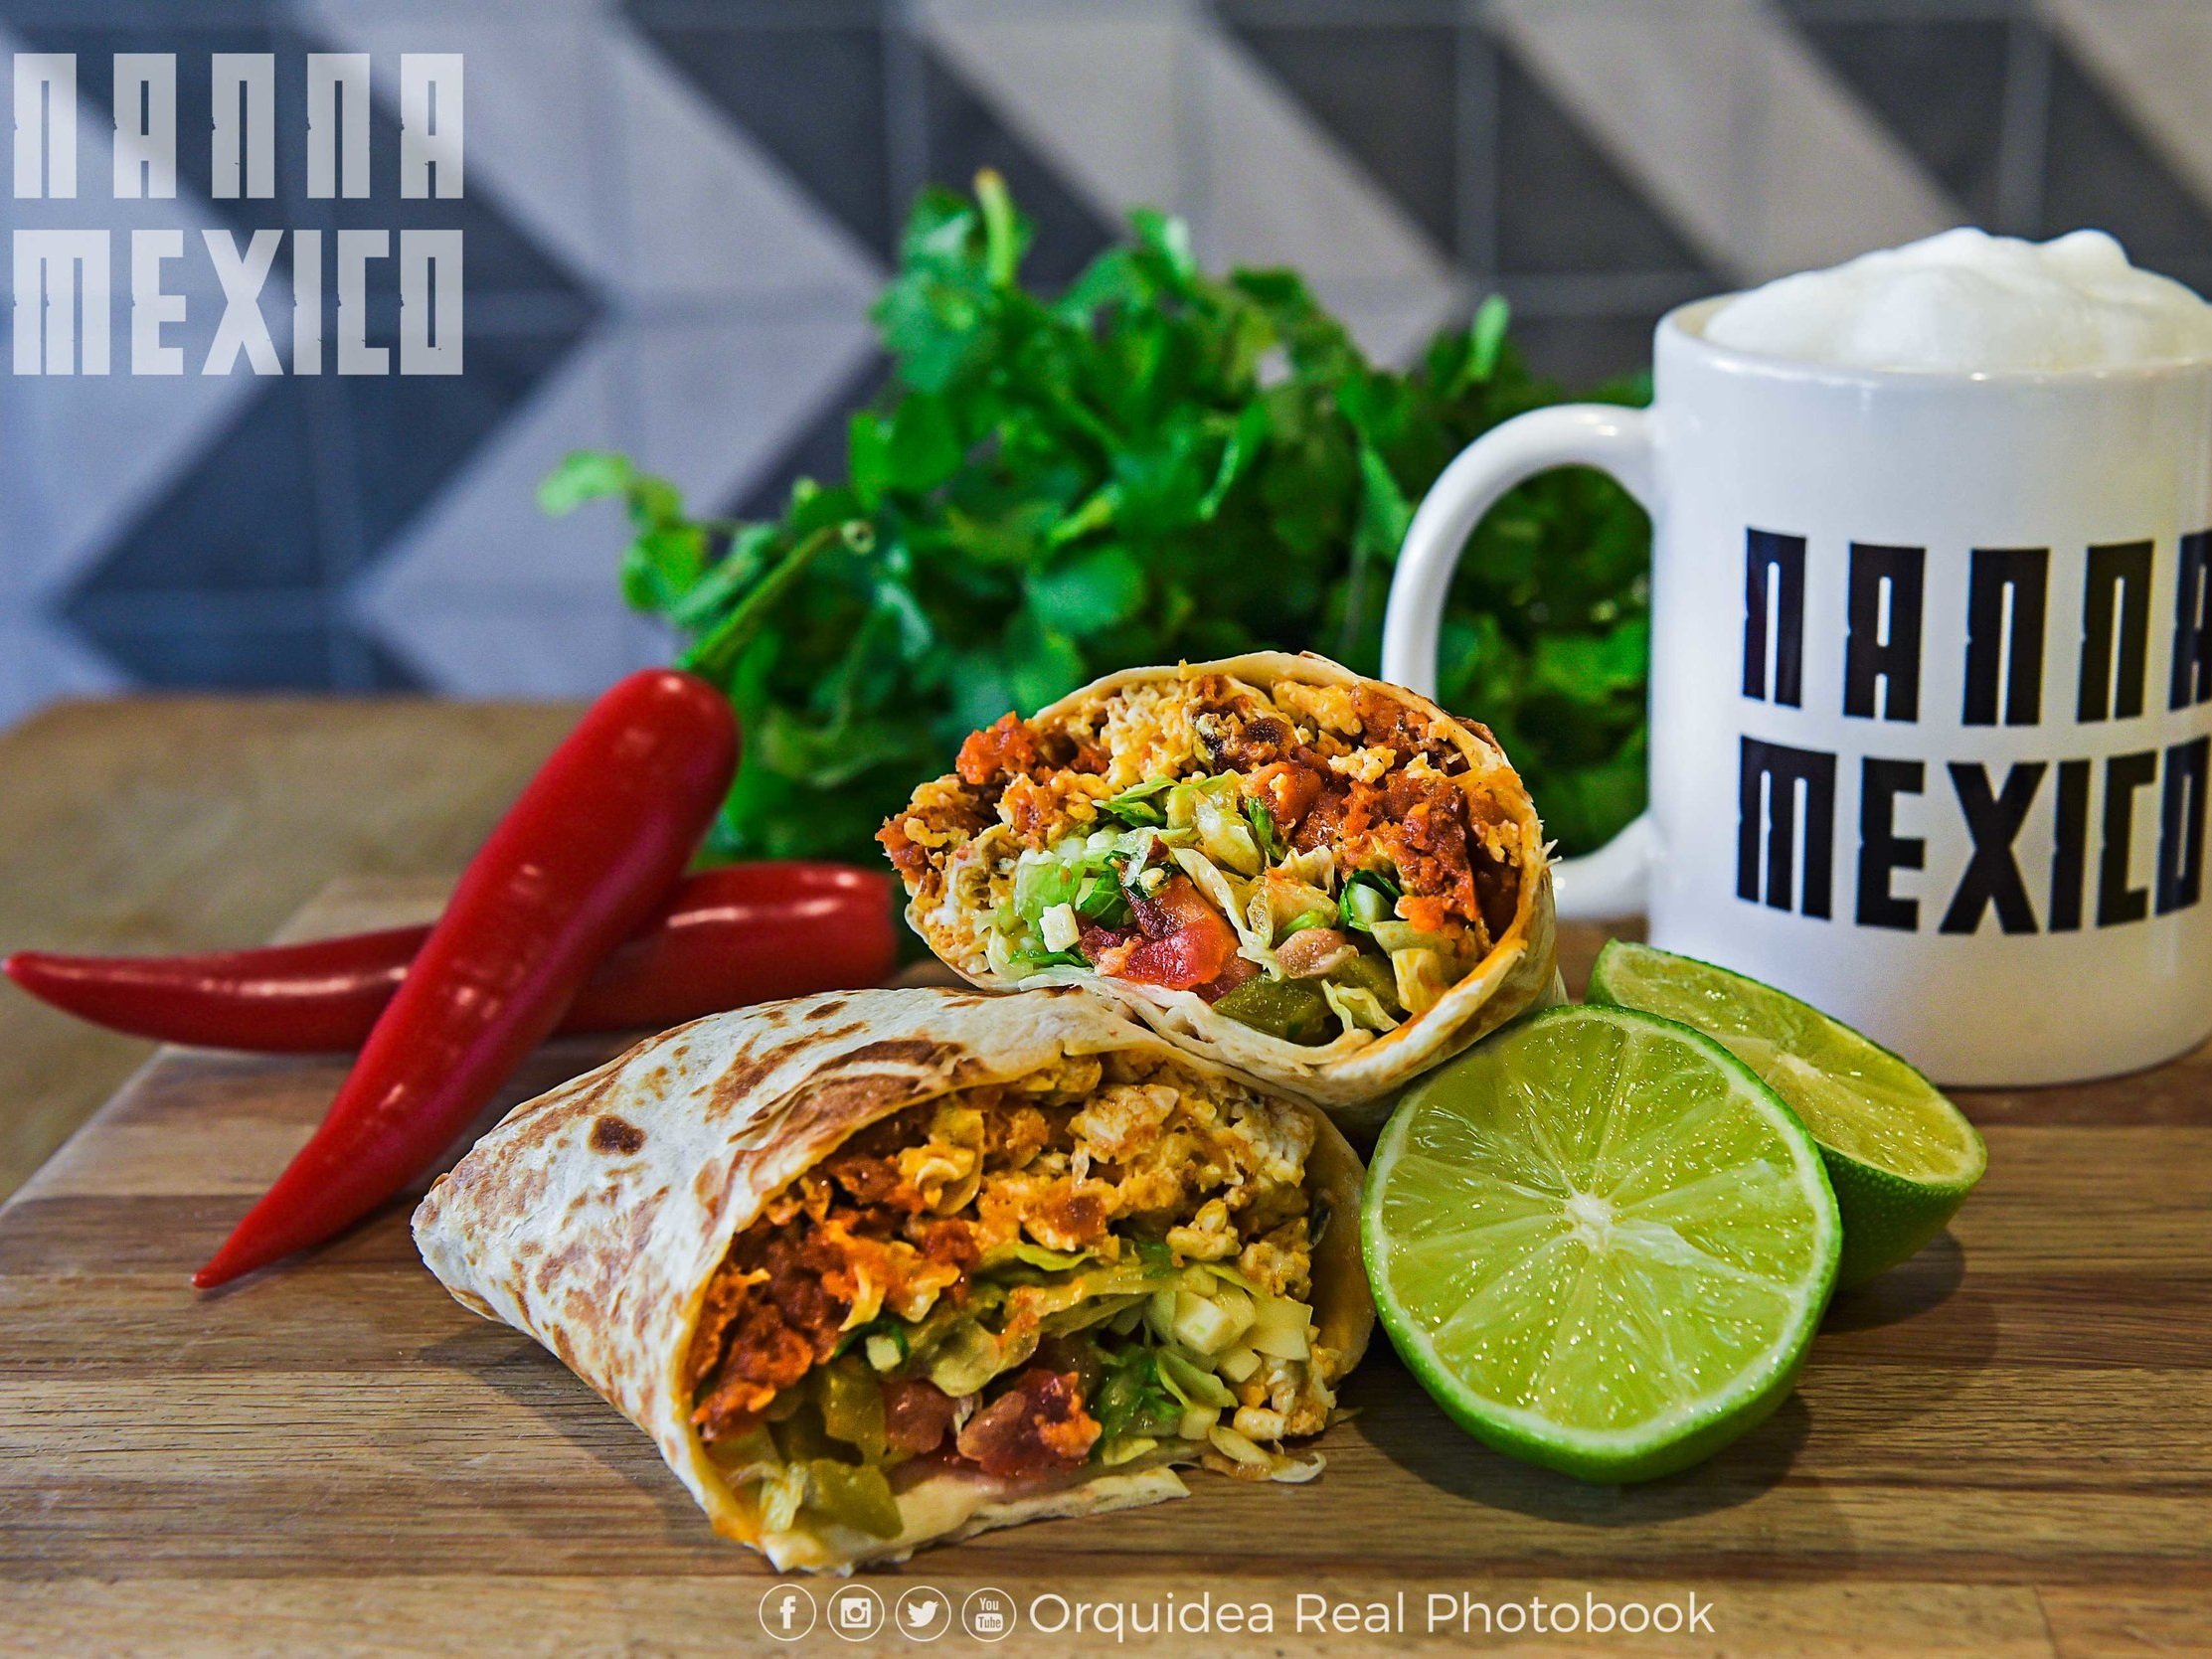 Nanna Mexico - £5 burrito and soft drink£6 burrito and Corona beer